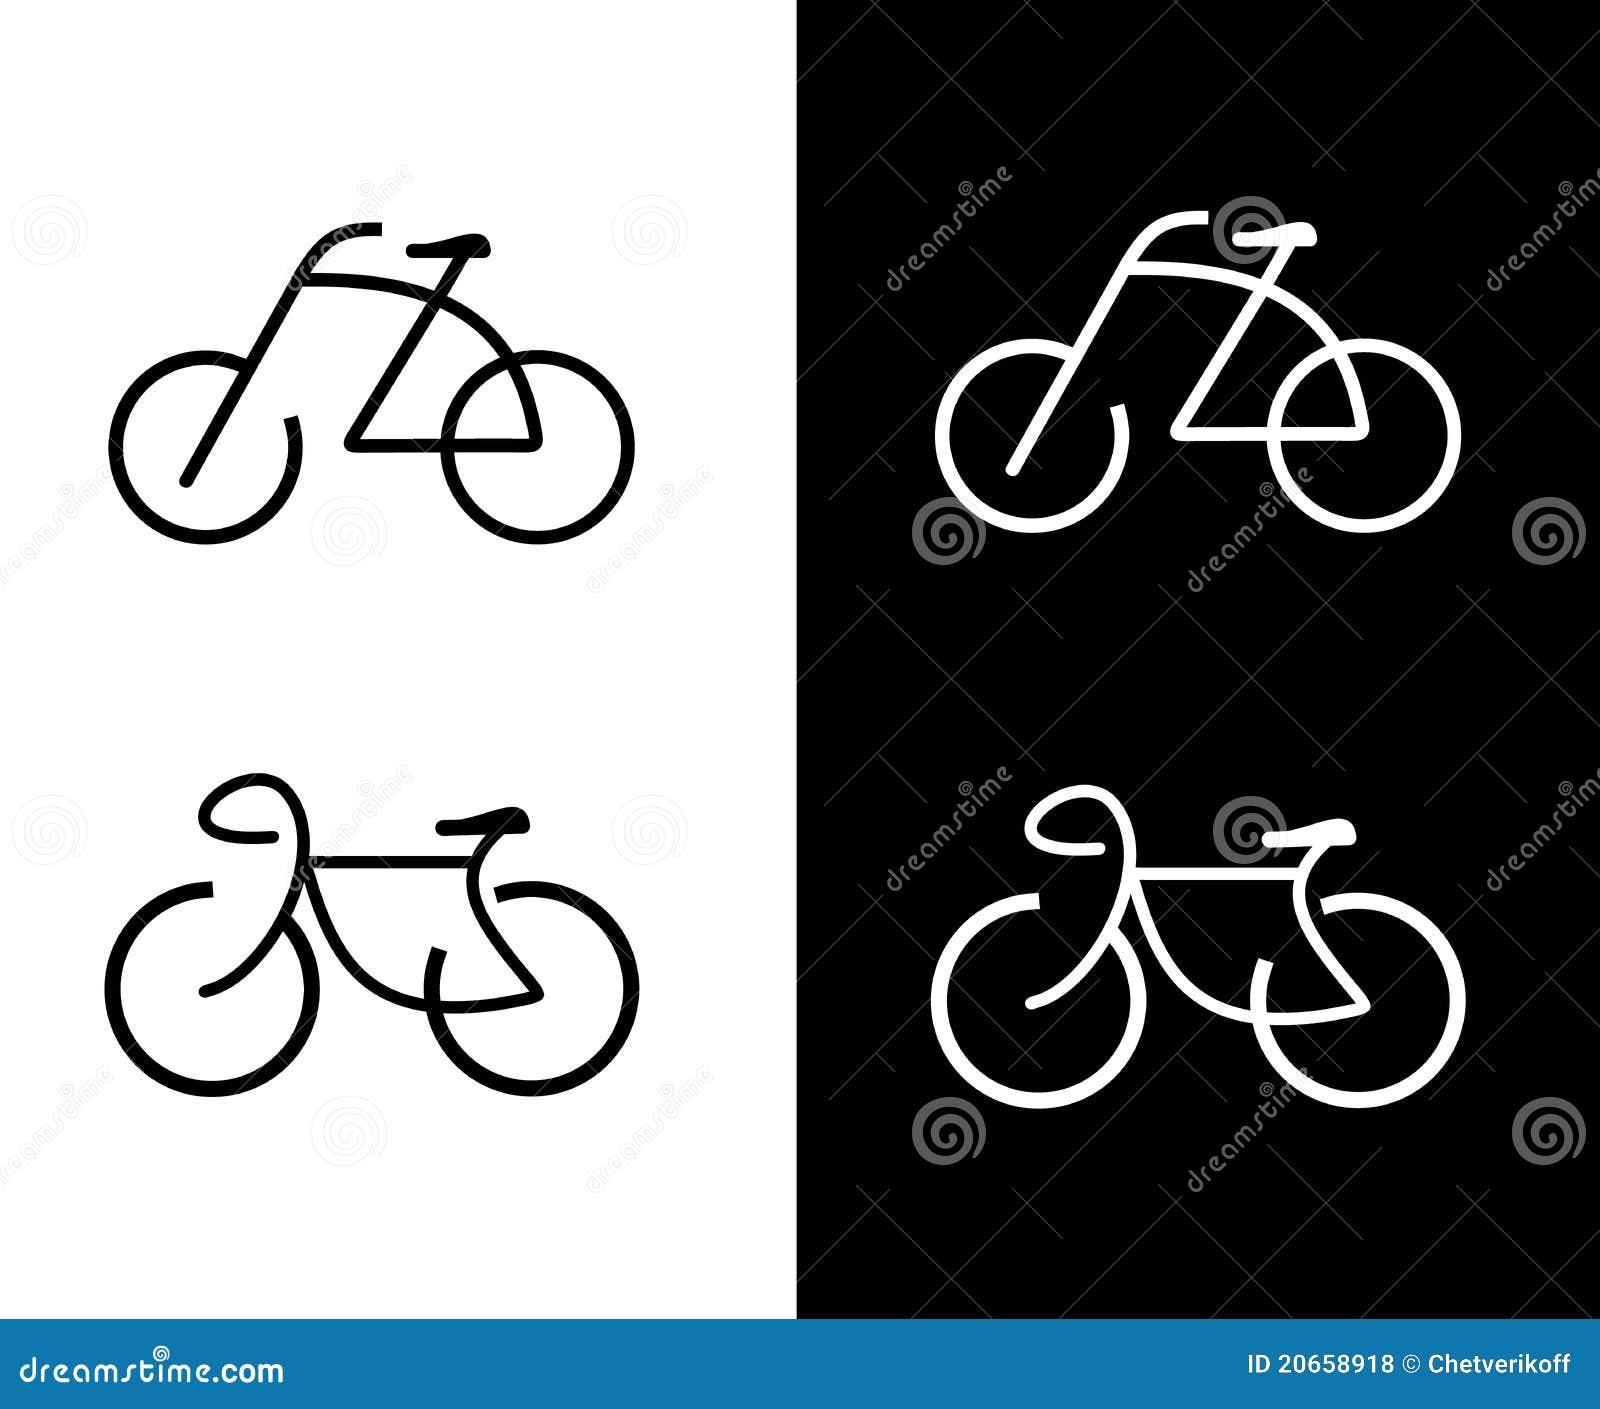 Bike Bicycle Icon Royalty Free Stock Photos Image